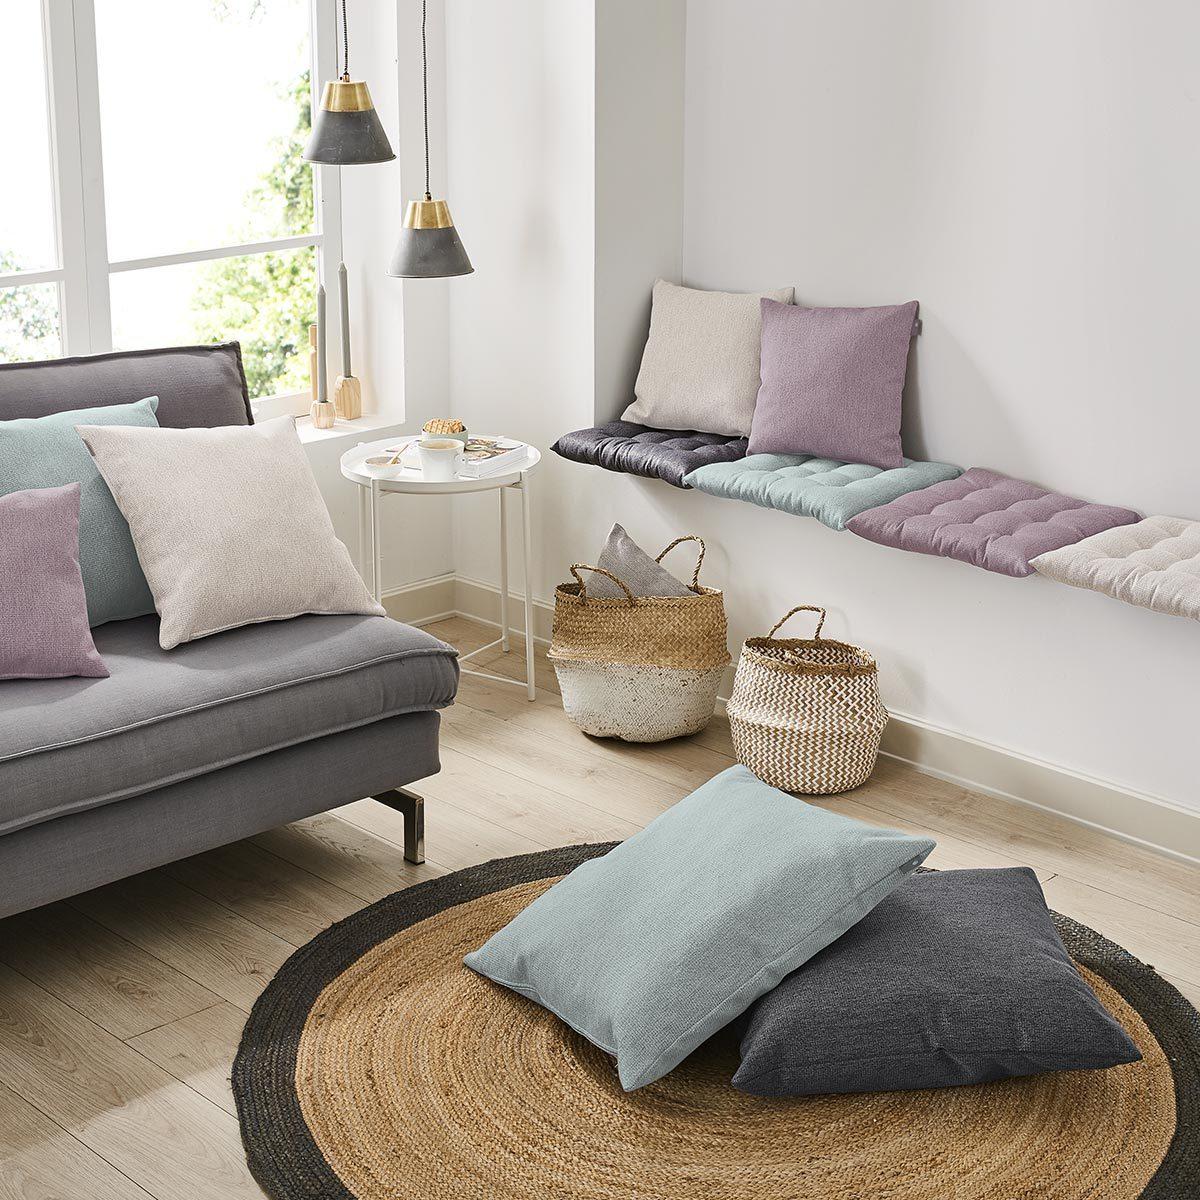 sun garden kissenh lle loft g nstig online kaufen bei bettwaren shop. Black Bedroom Furniture Sets. Home Design Ideas